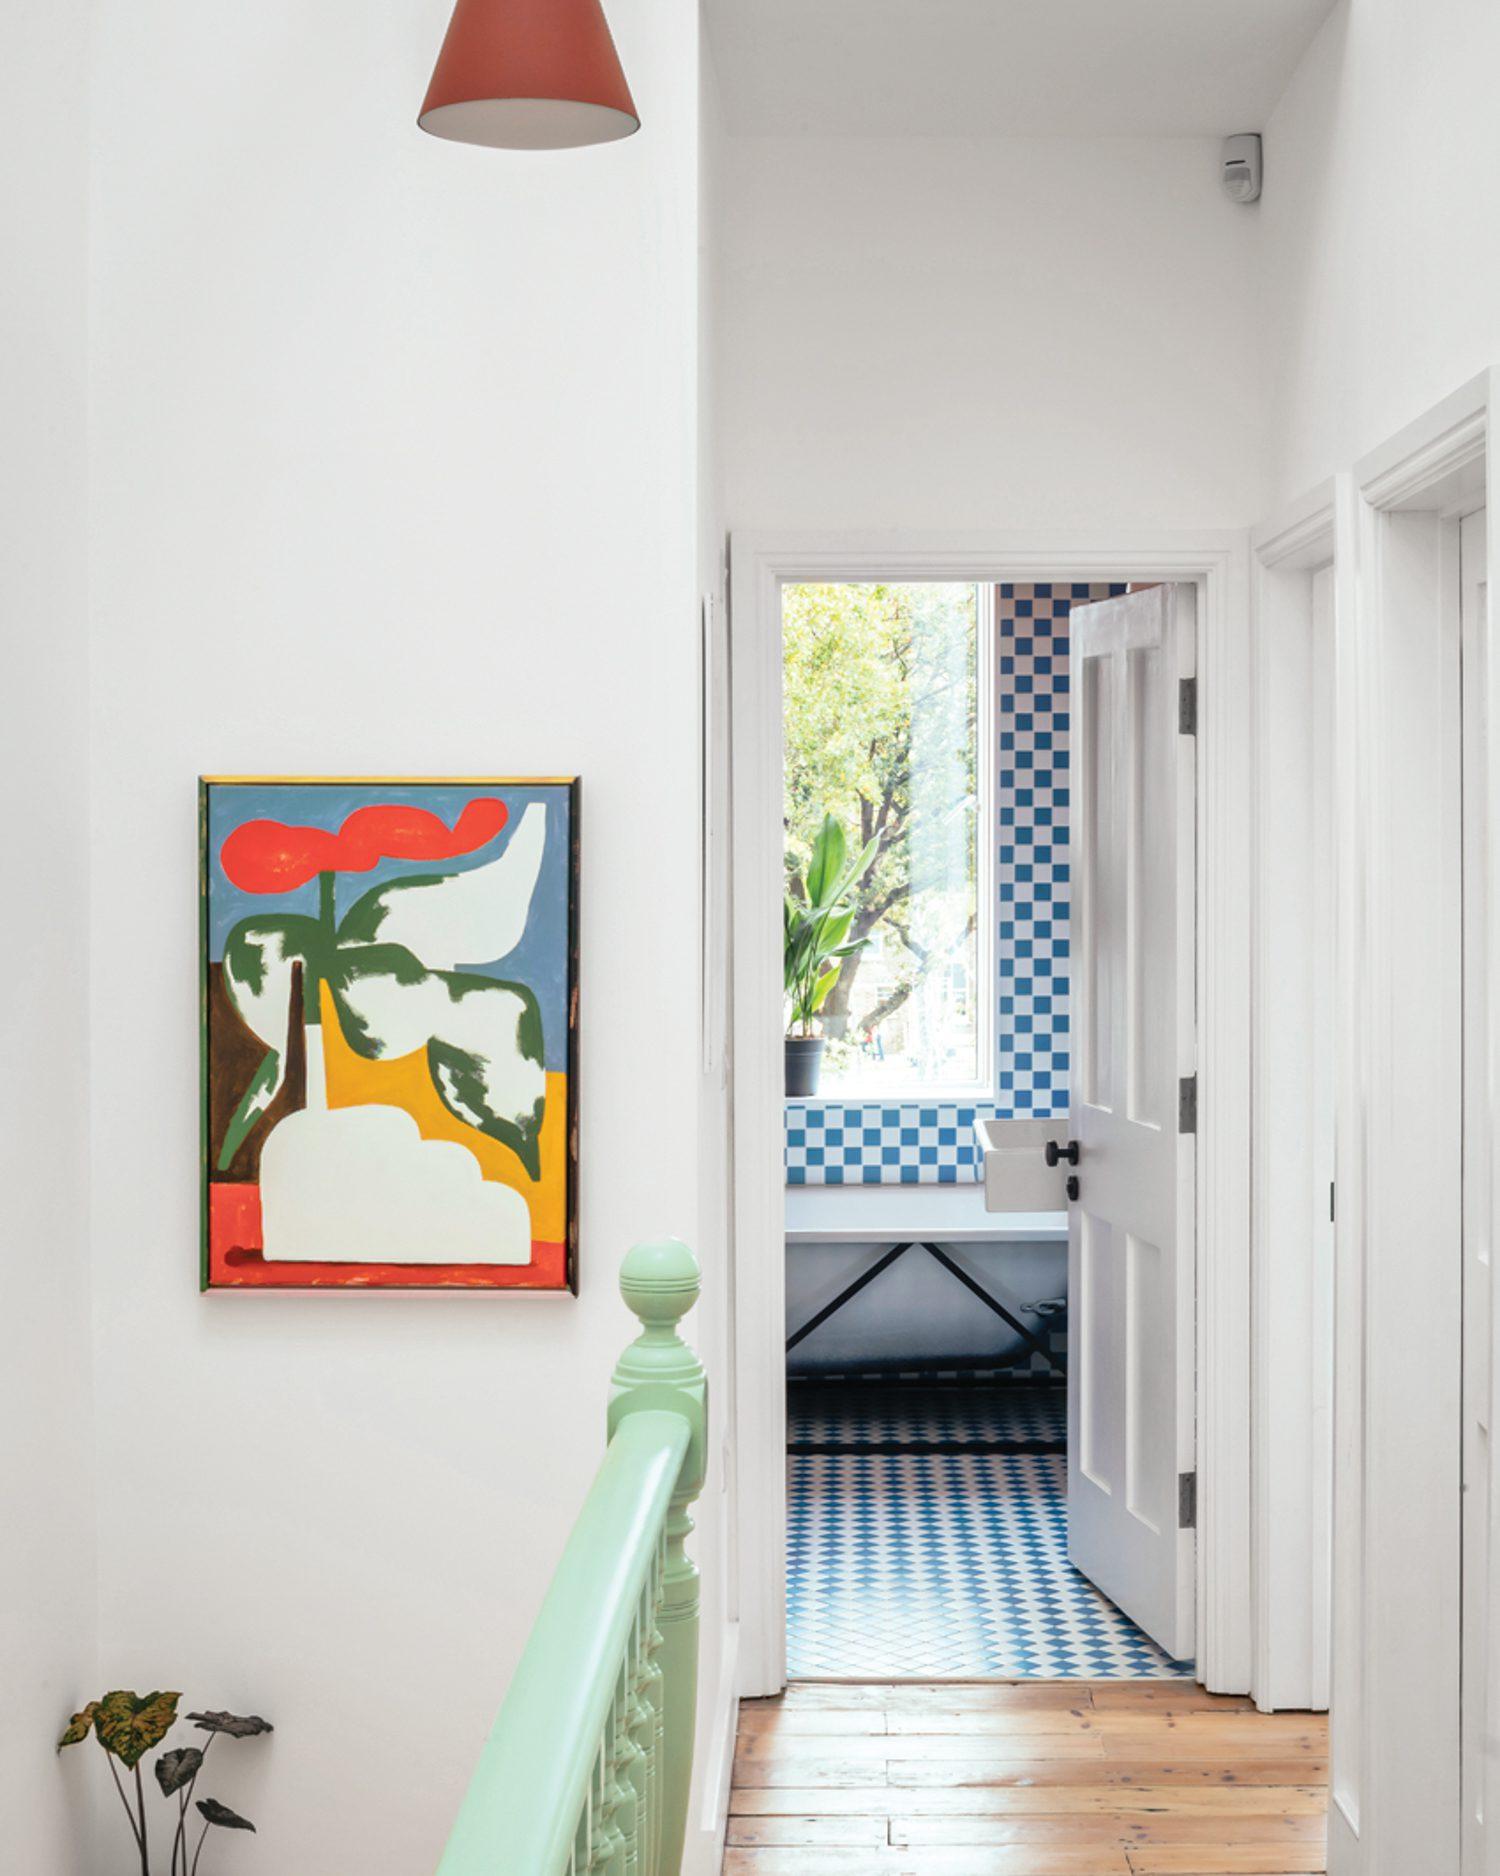 The upper-level hall boasts an acrylic on canvas by Jordy van den Nieuwendijk.